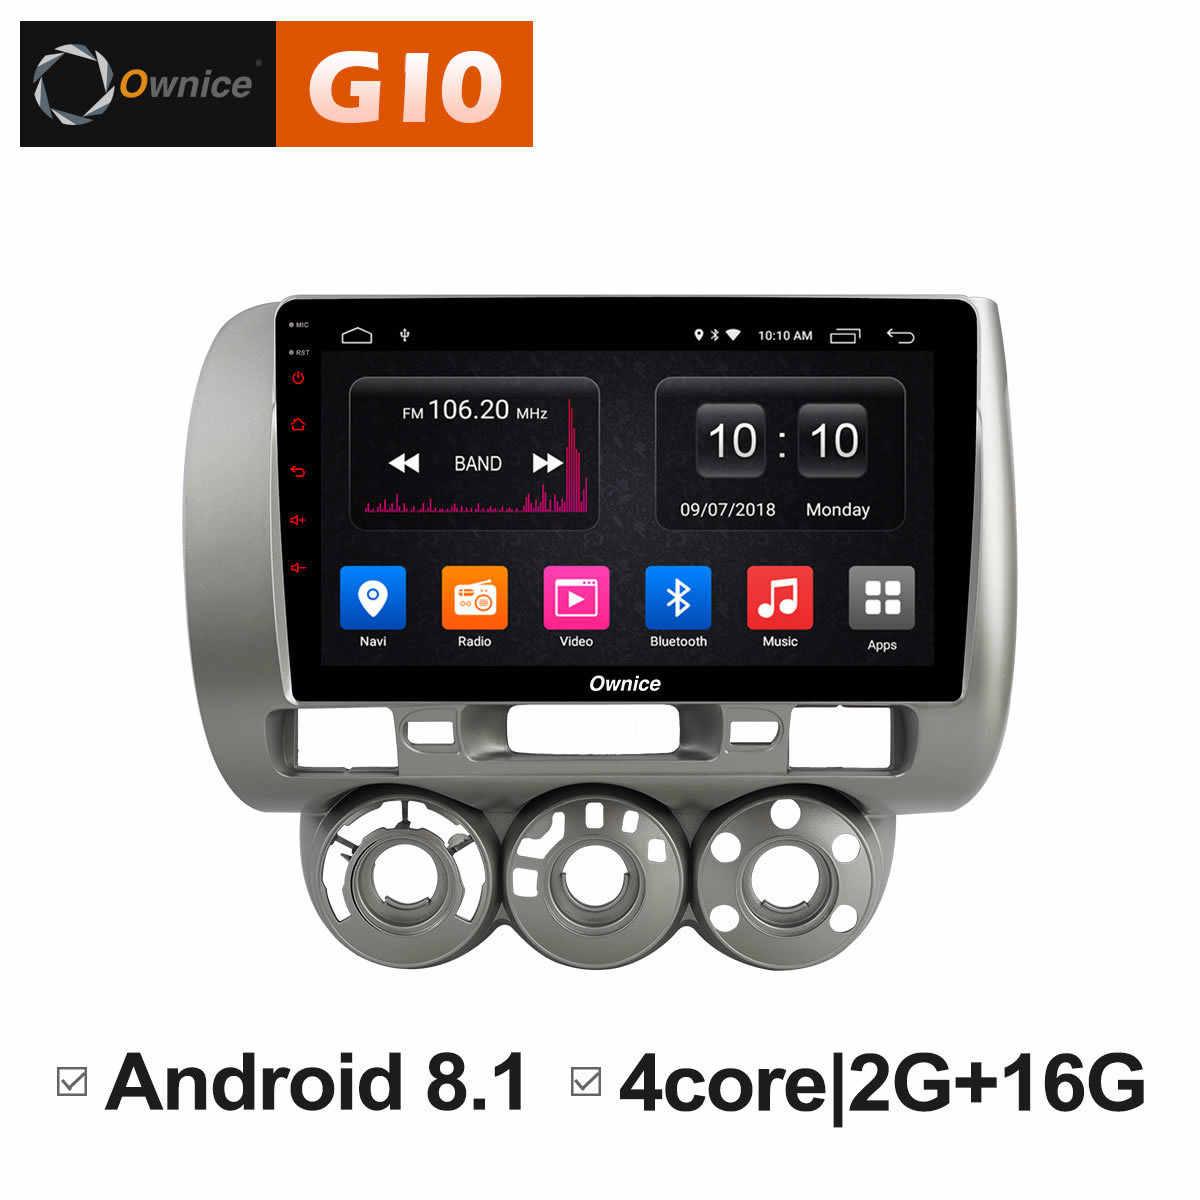 Ownice C500 + G10 IPS Android 8.1 Auto DVD Multimedia Speler GPS Voor honda Fit jazz 2004 2005 2006 2007 radio stereo navigatie